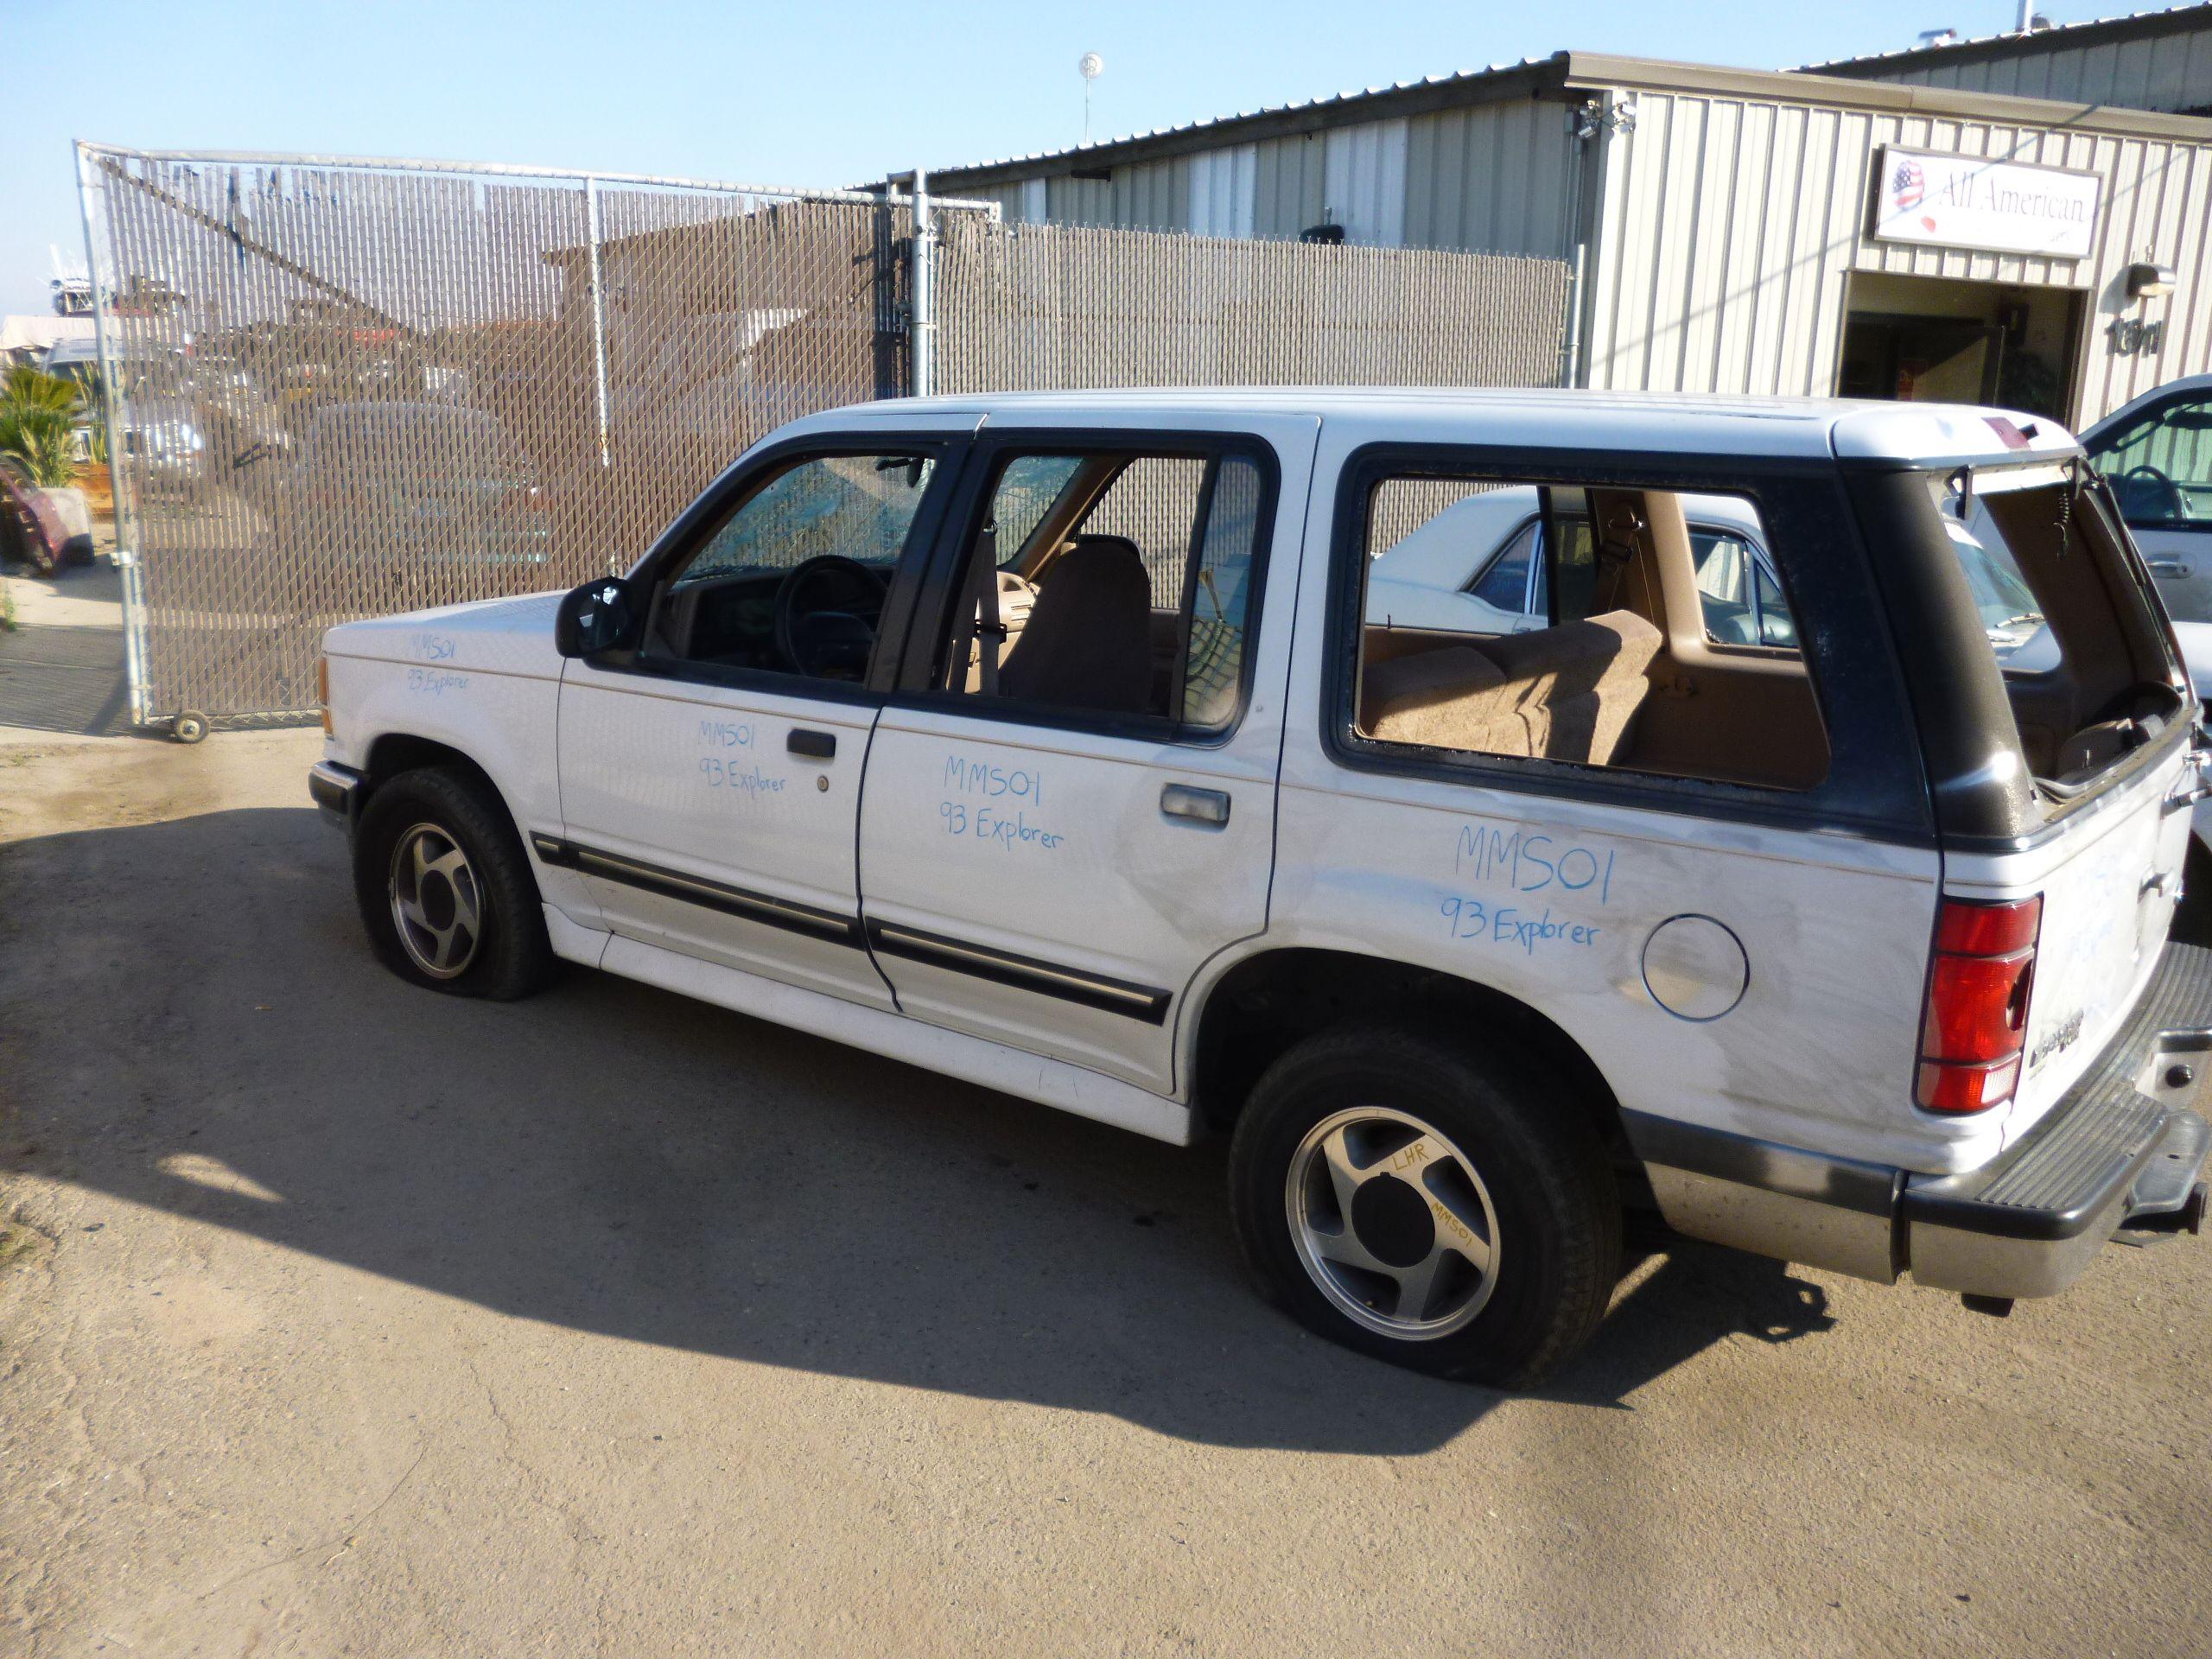 1993 Ford Explorer Xlt 4 Dr 2wd 4 0l 76k Miles Ball Joint Brake